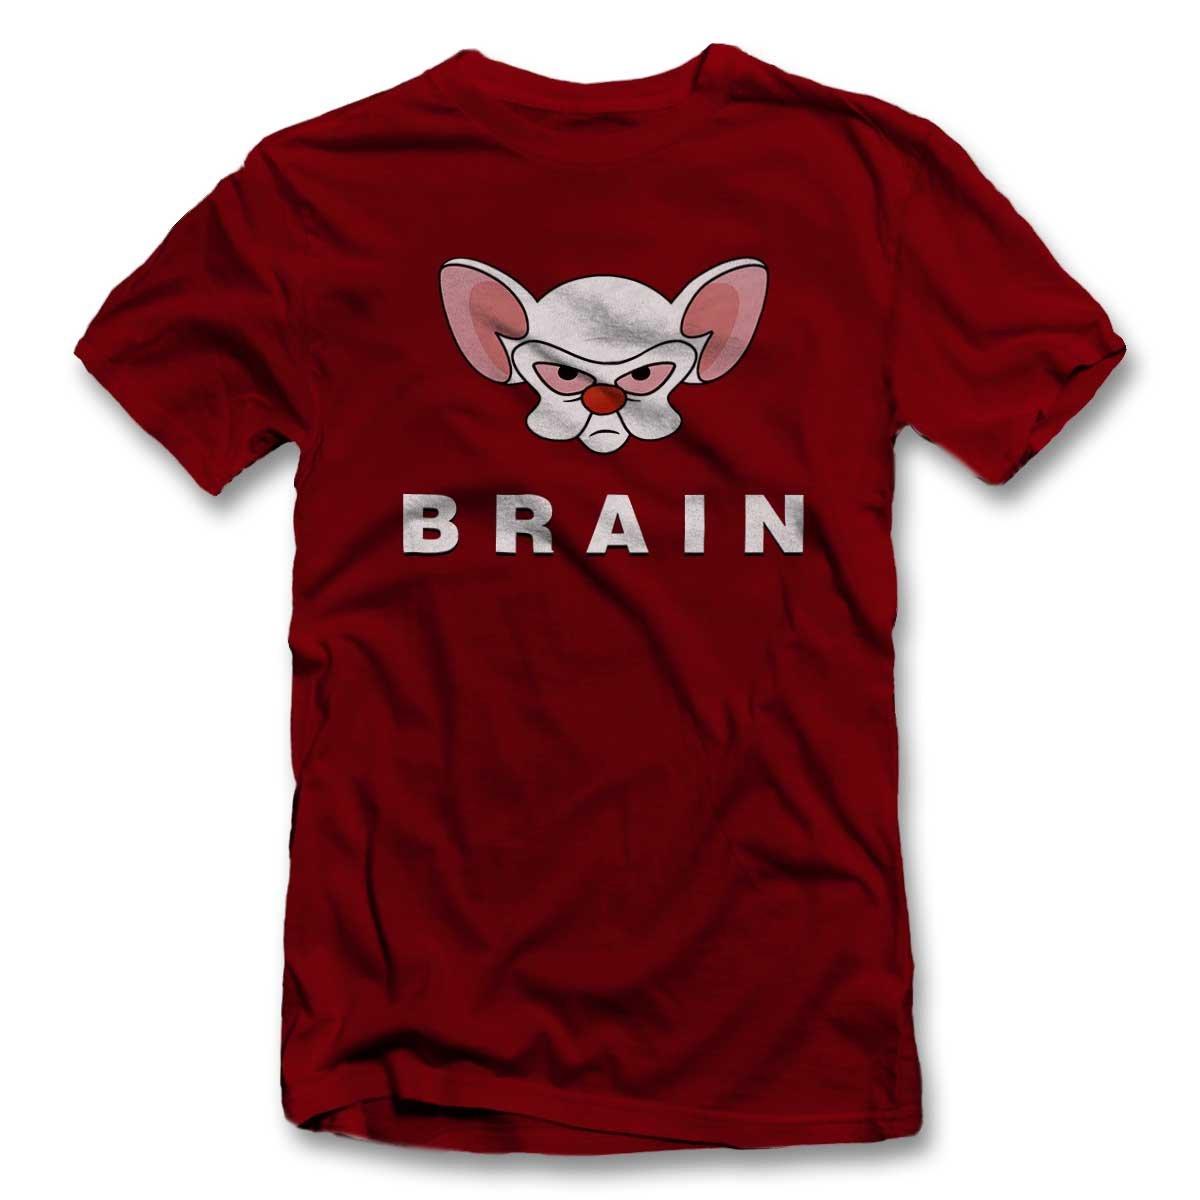 89ff8d52ec5 shirtground Pinky Brain Camiseta S-XXL 12 Colores Colours  Amazon.es  Ropa  y accesorios